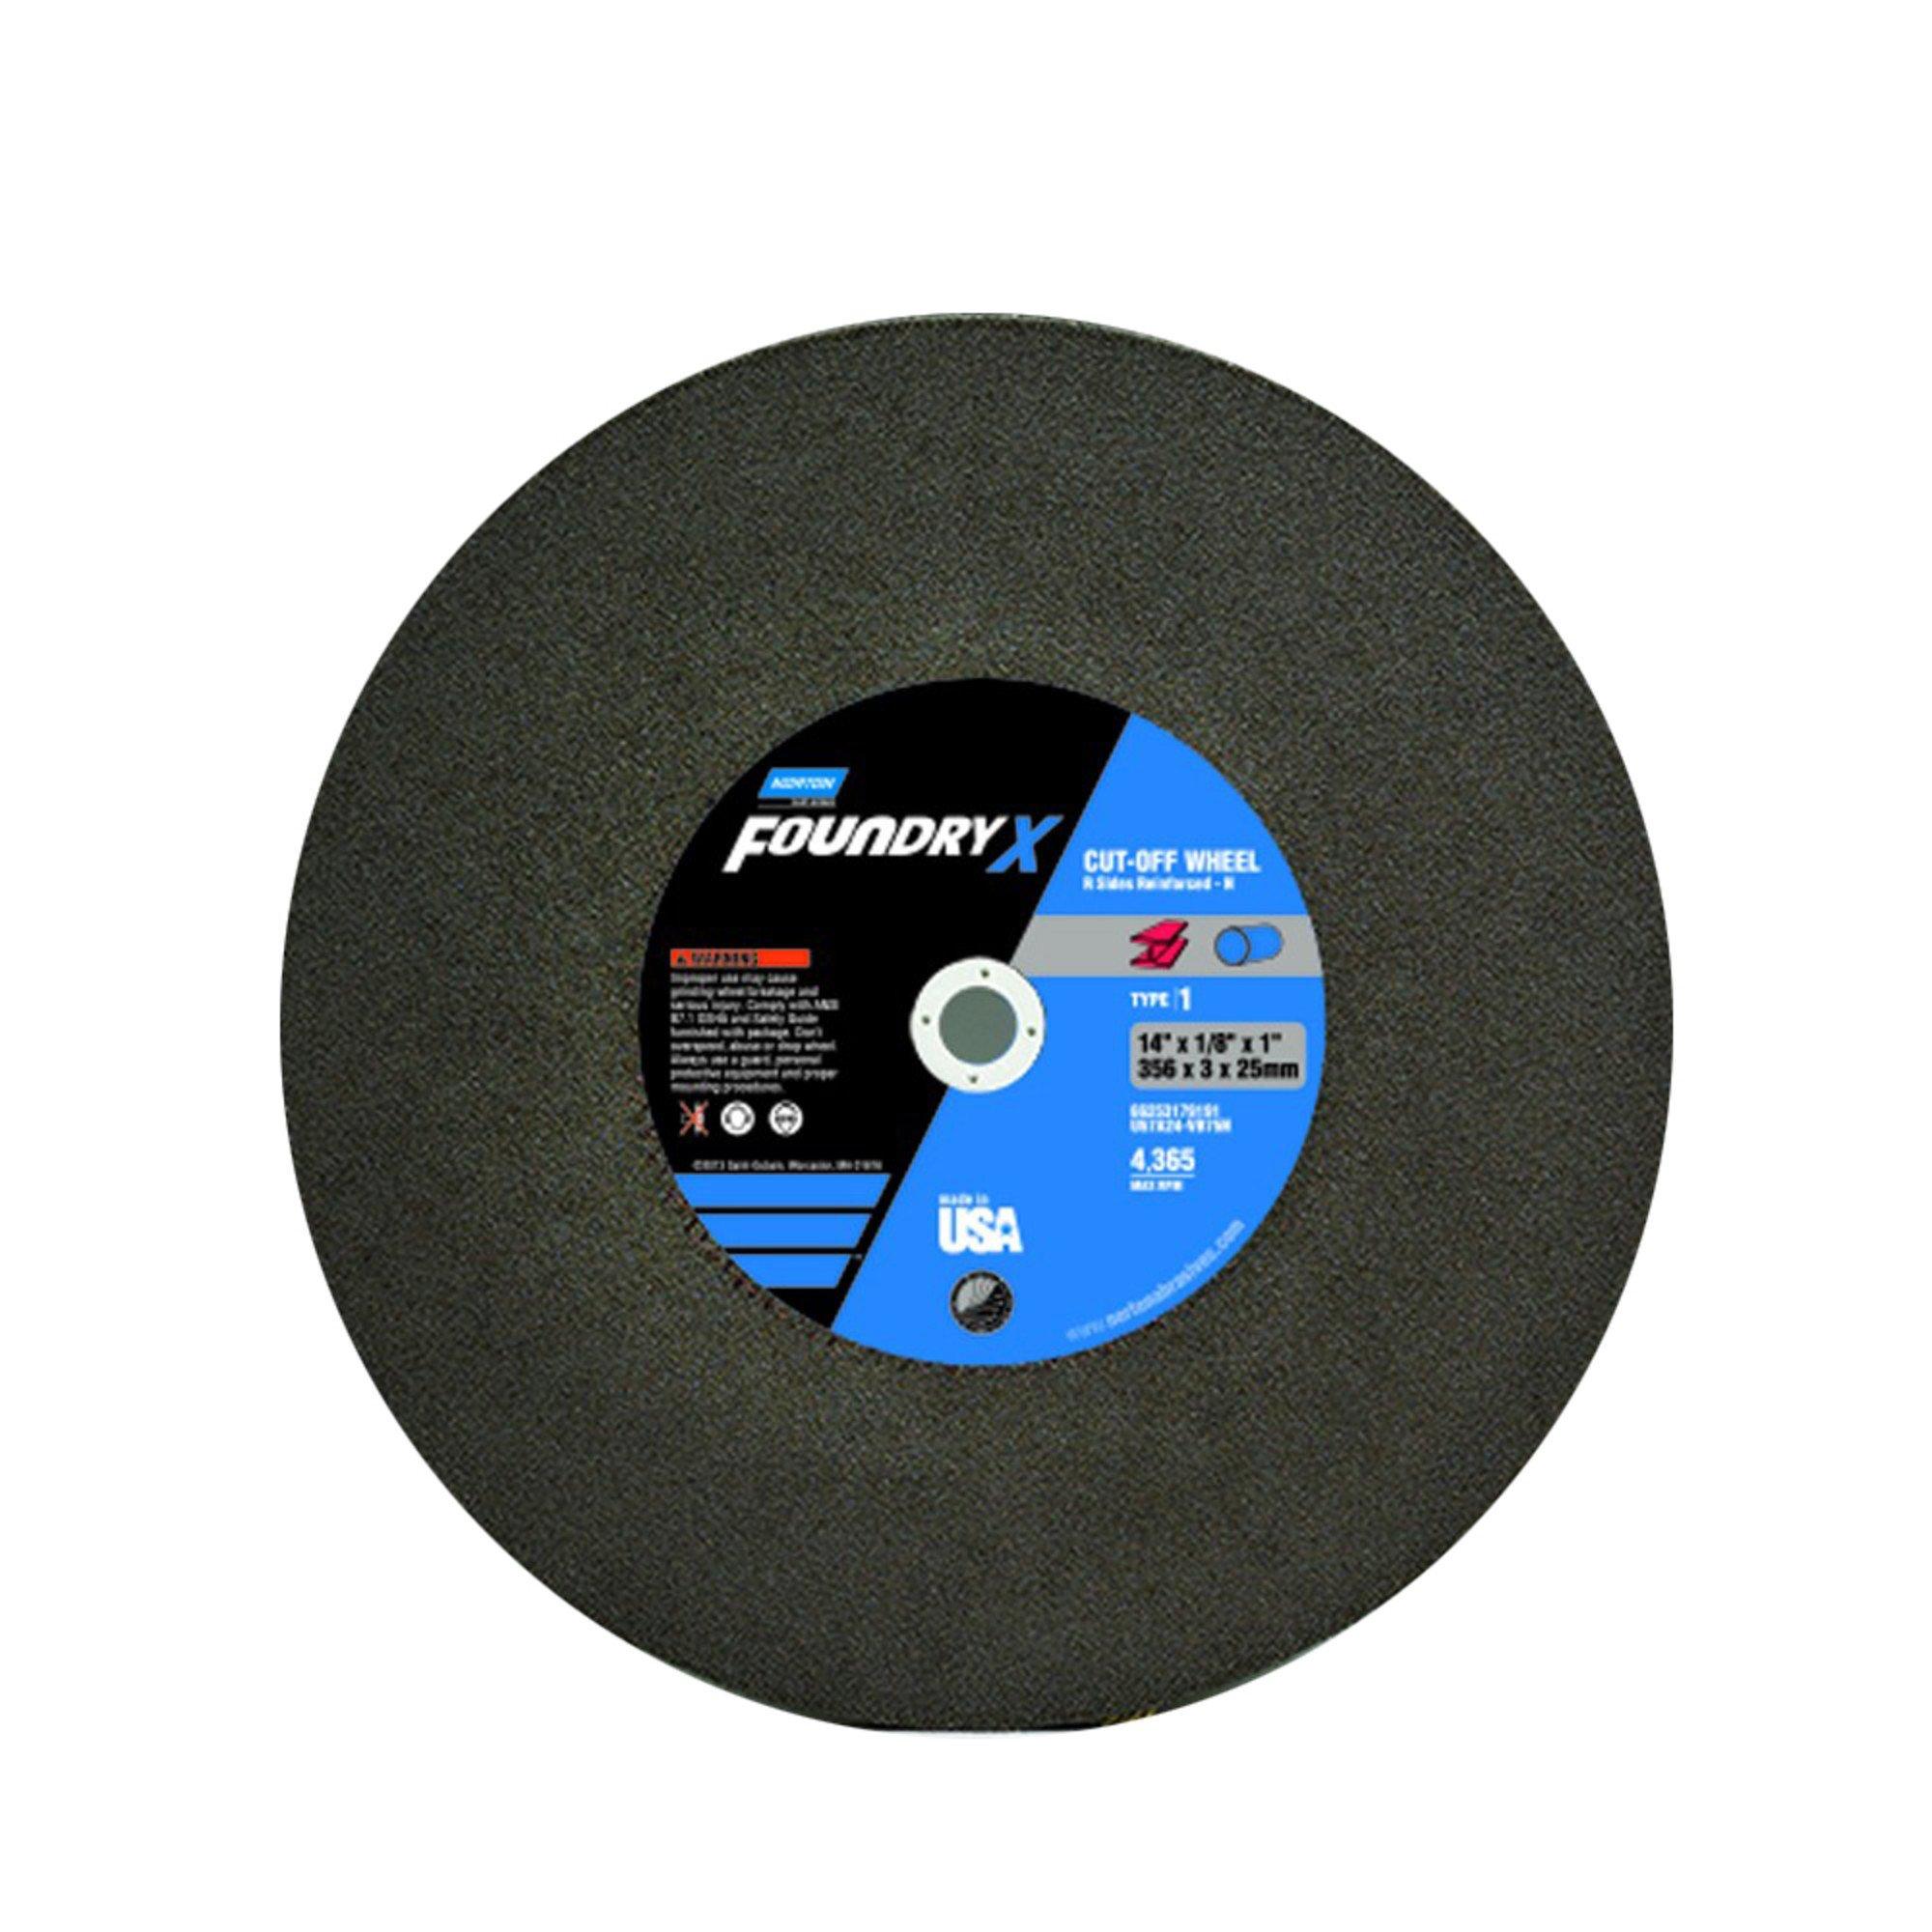 Norton 66253179191 Surface Grinding Wheels Size 14 x 1/8 x 1